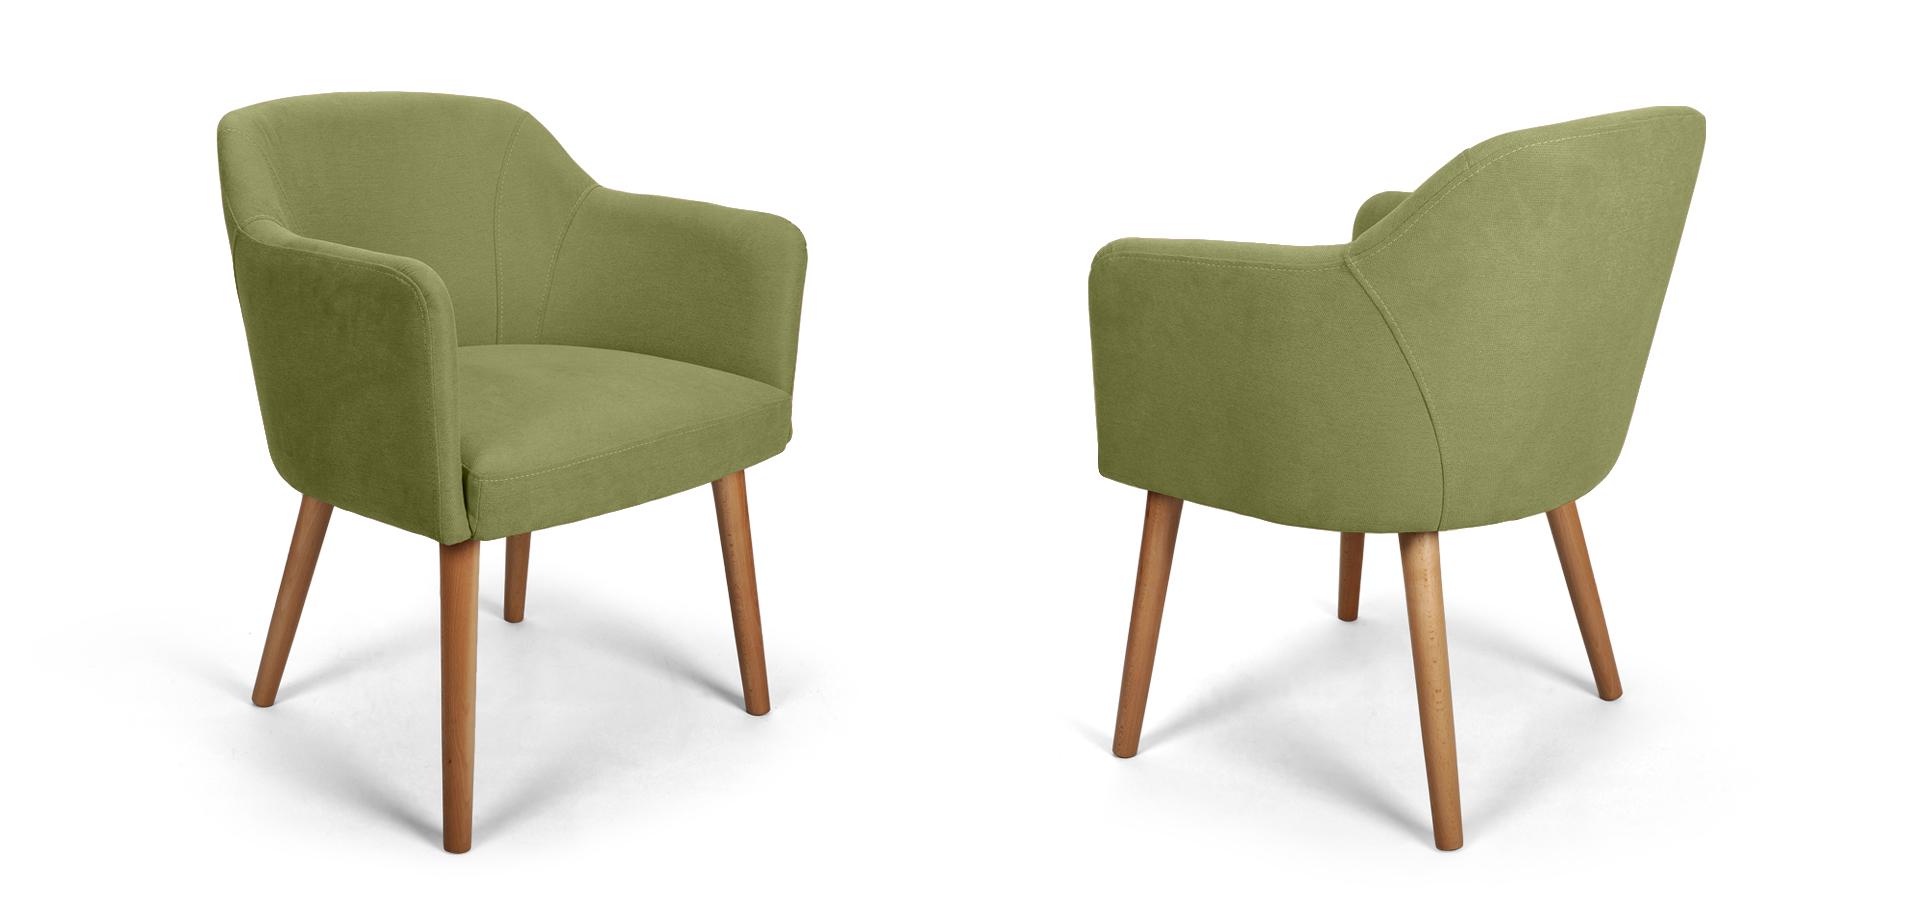 sofia-scaun-06.jpg